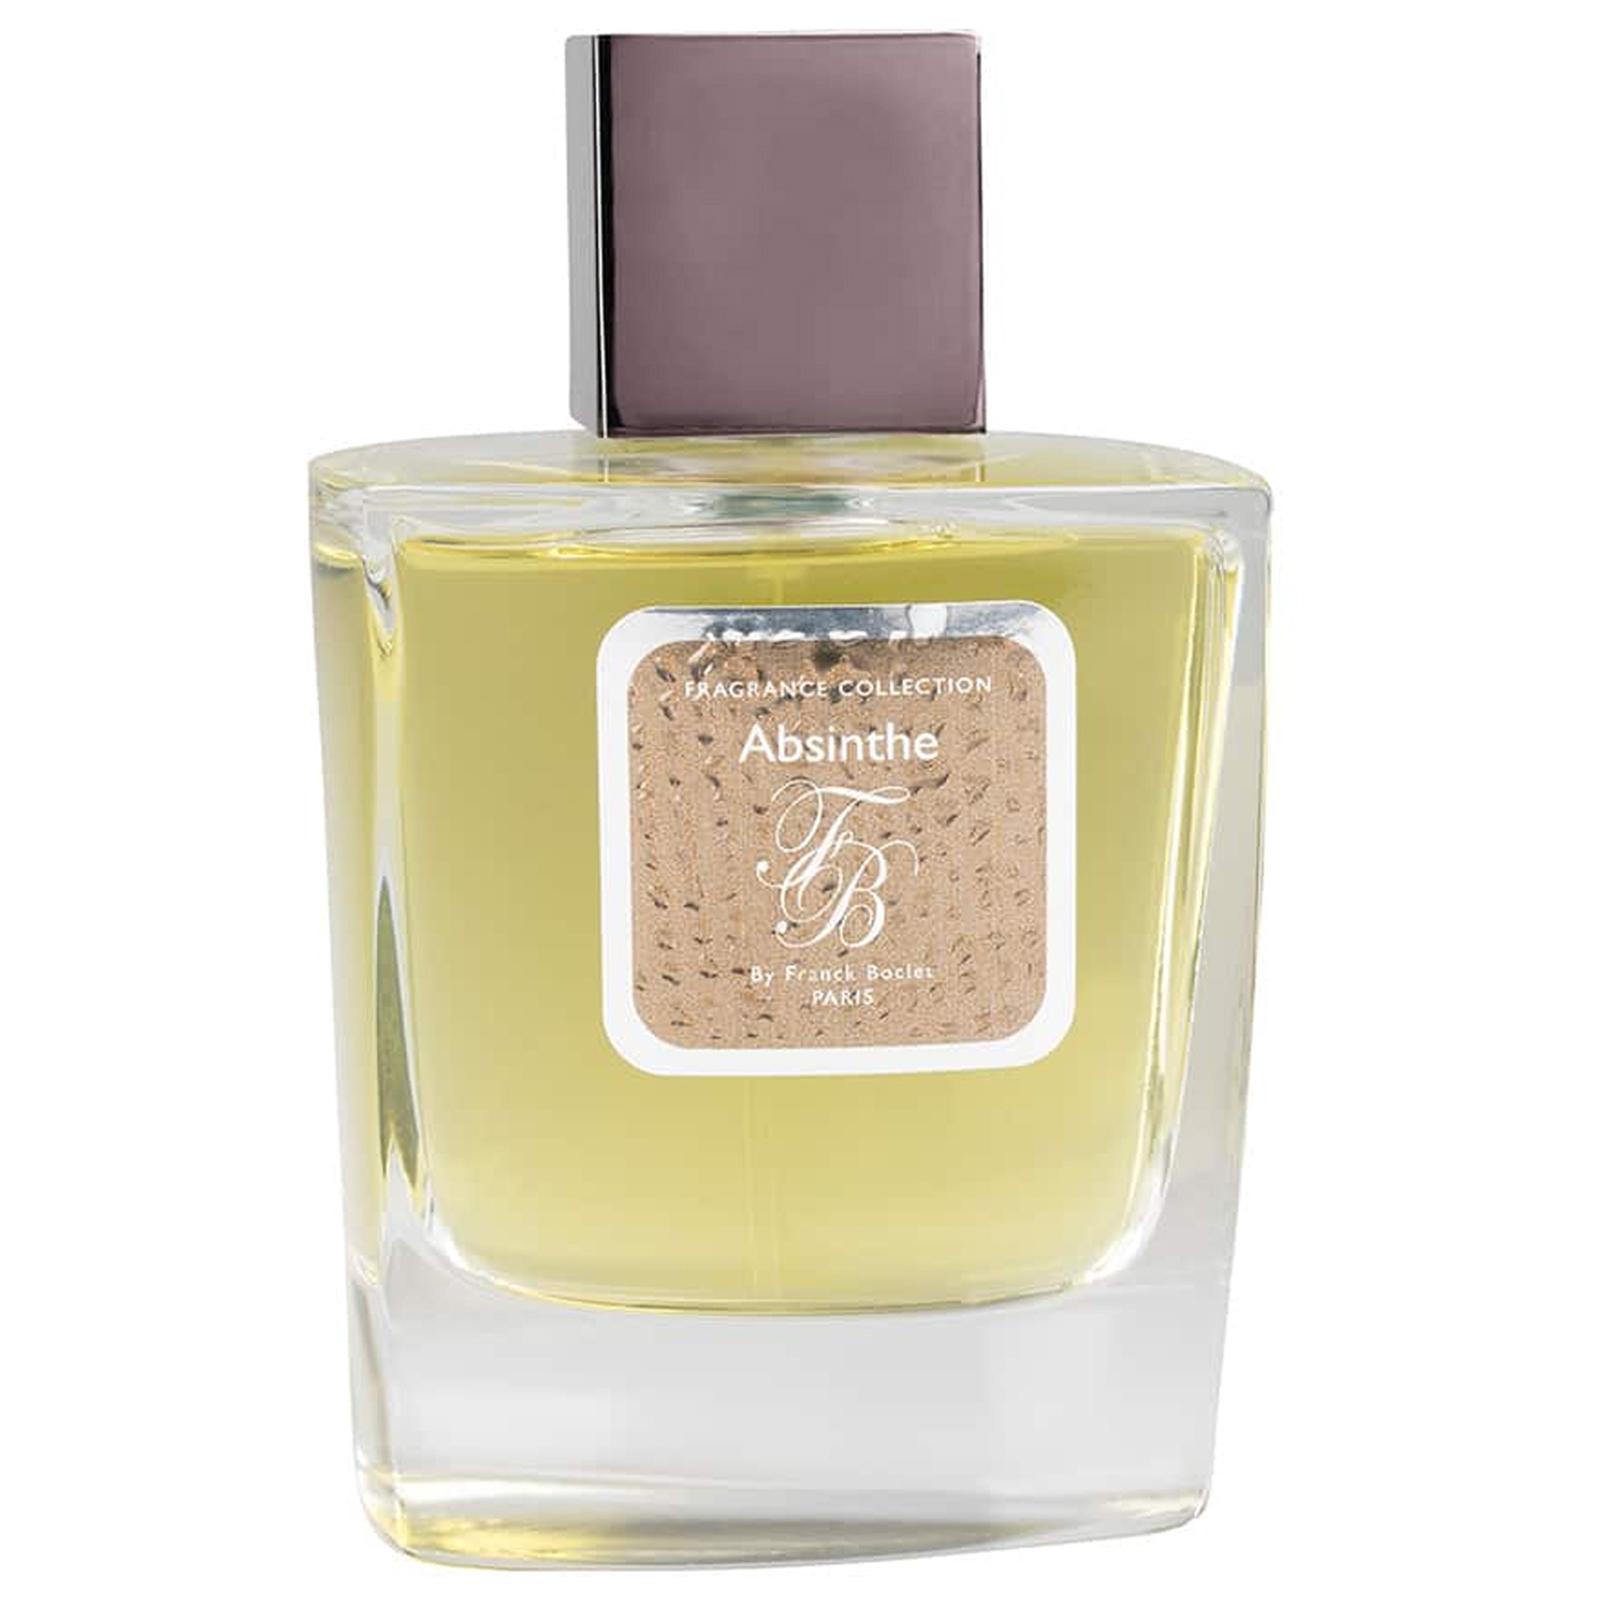 Absinthe profumo eau de parfum 100 ml